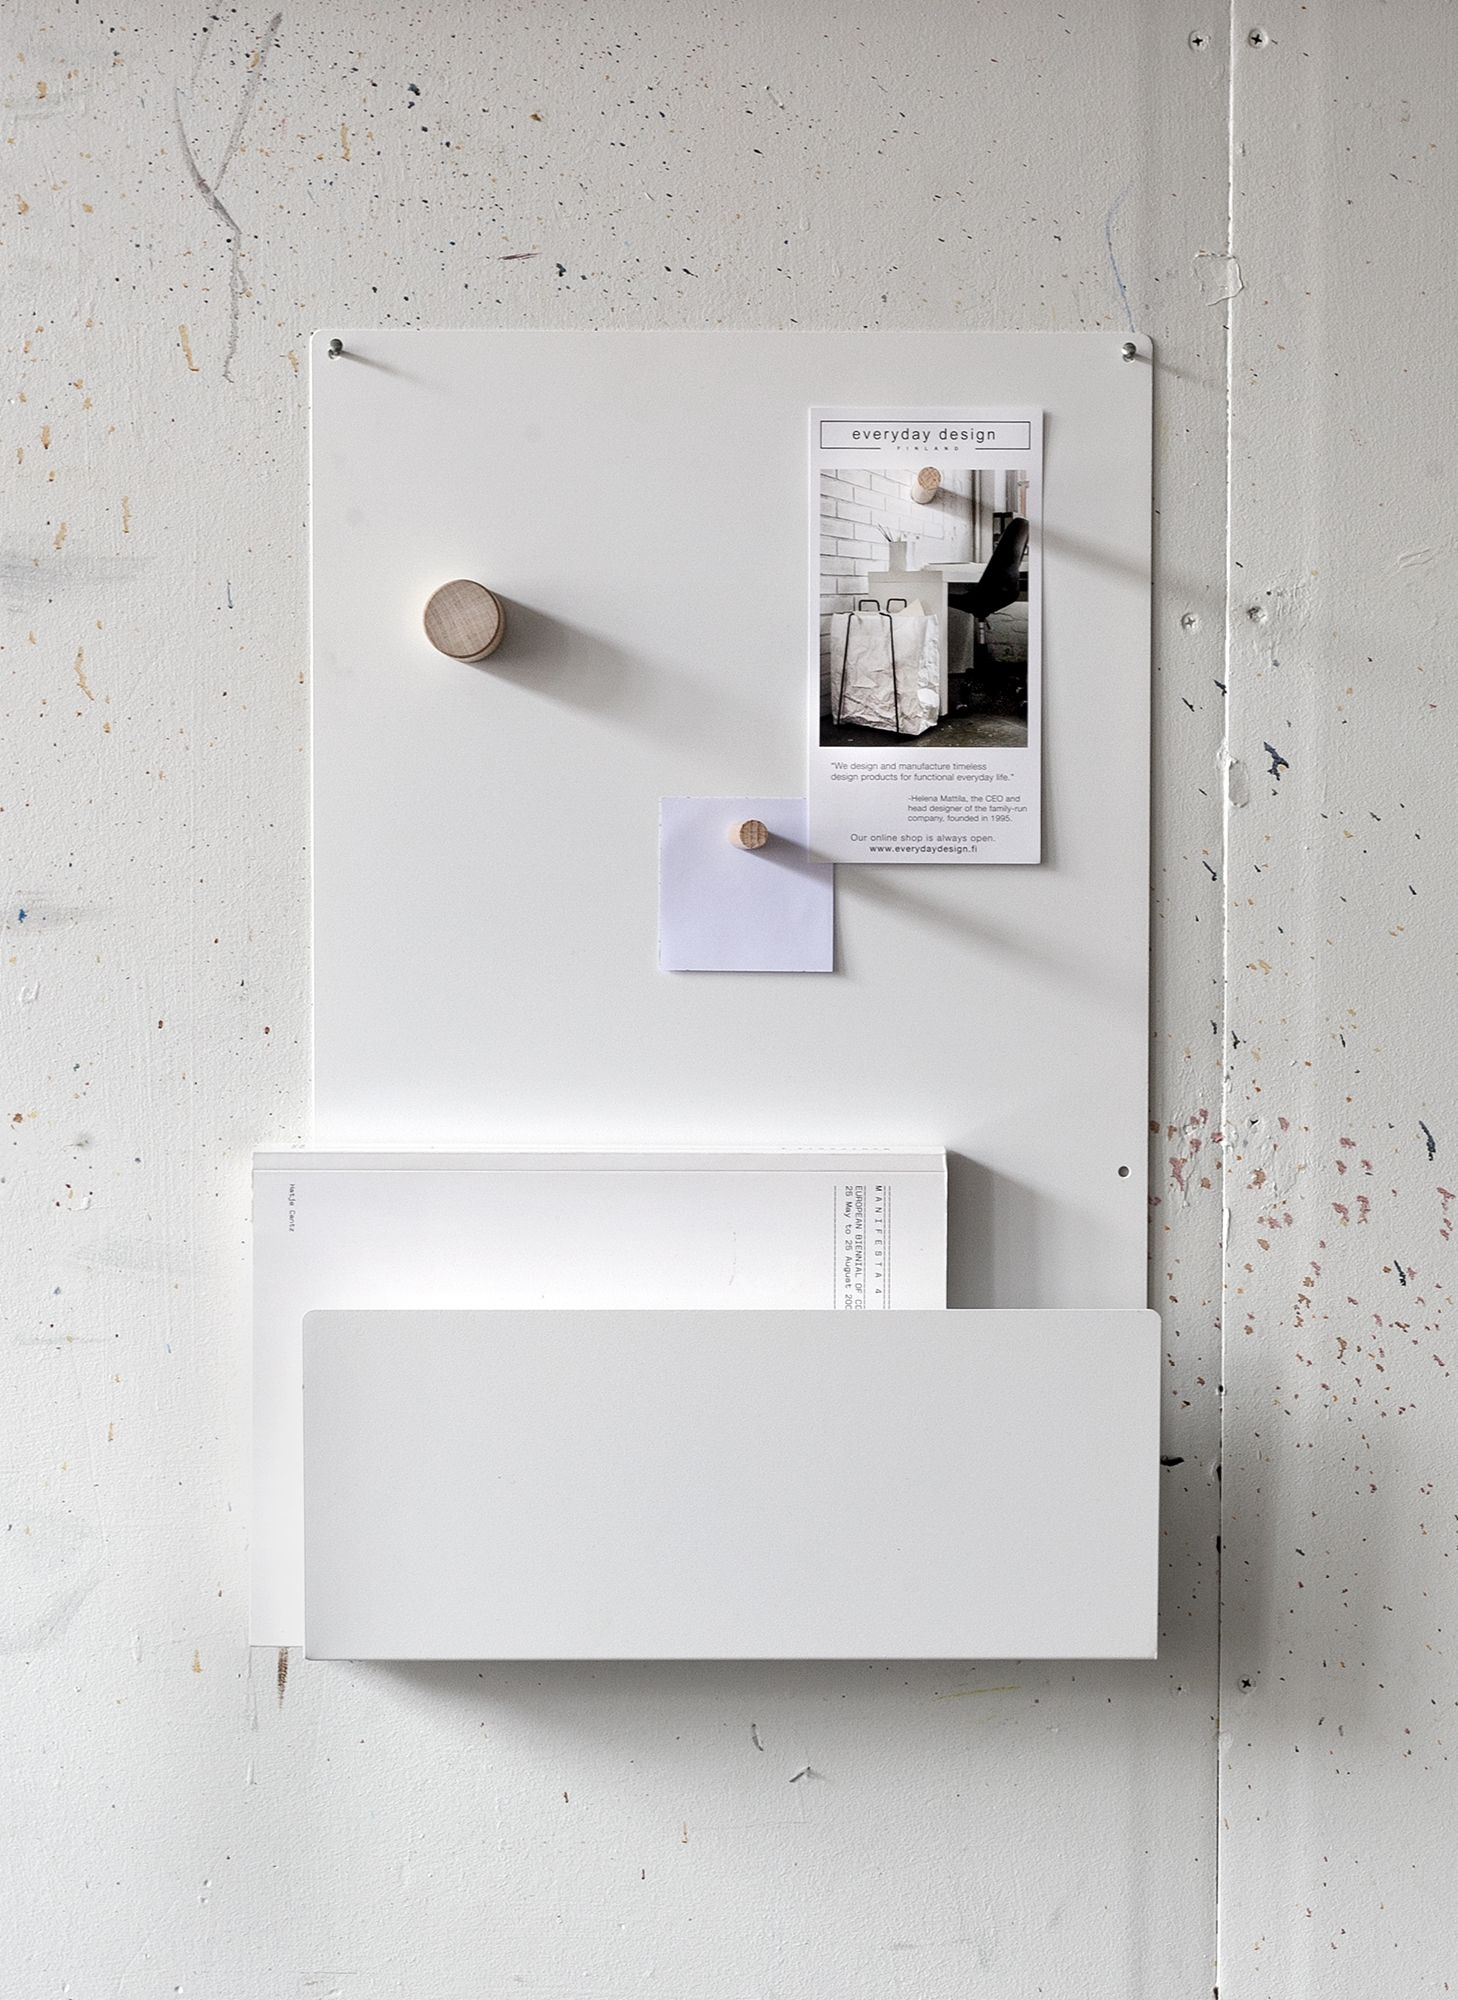 Hallway key storage  Simple Sustainable Storage from Everyday Design in Finland